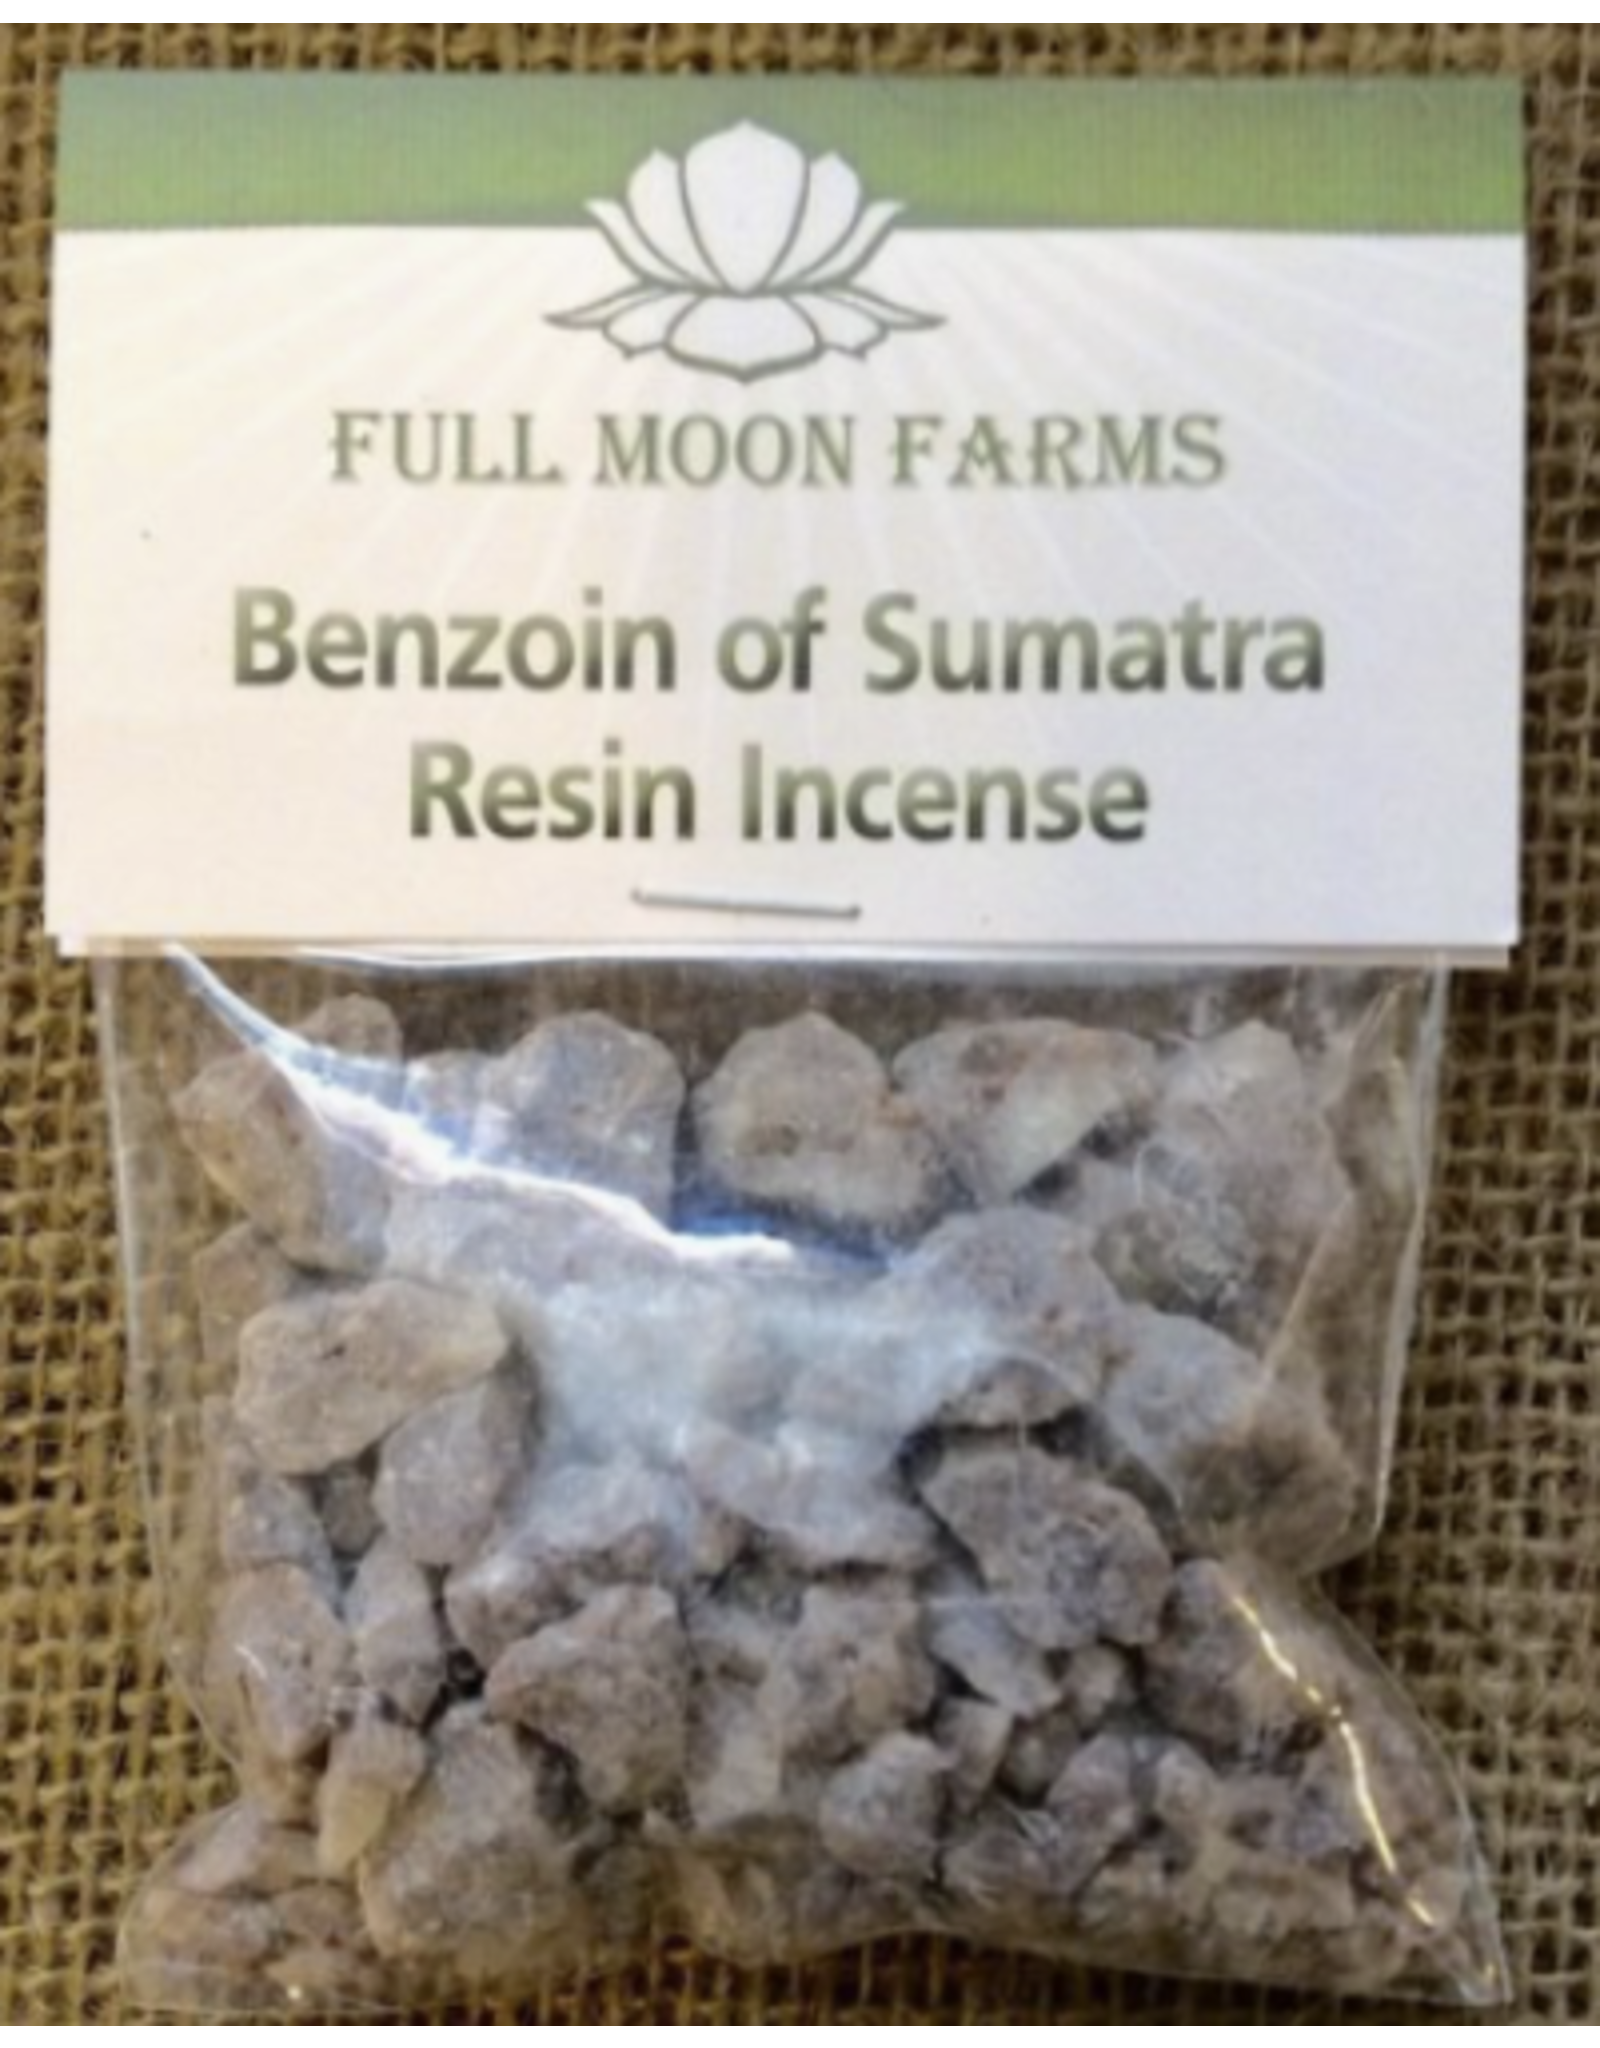 Benzoin of Sumatra Resin Incense 1oz